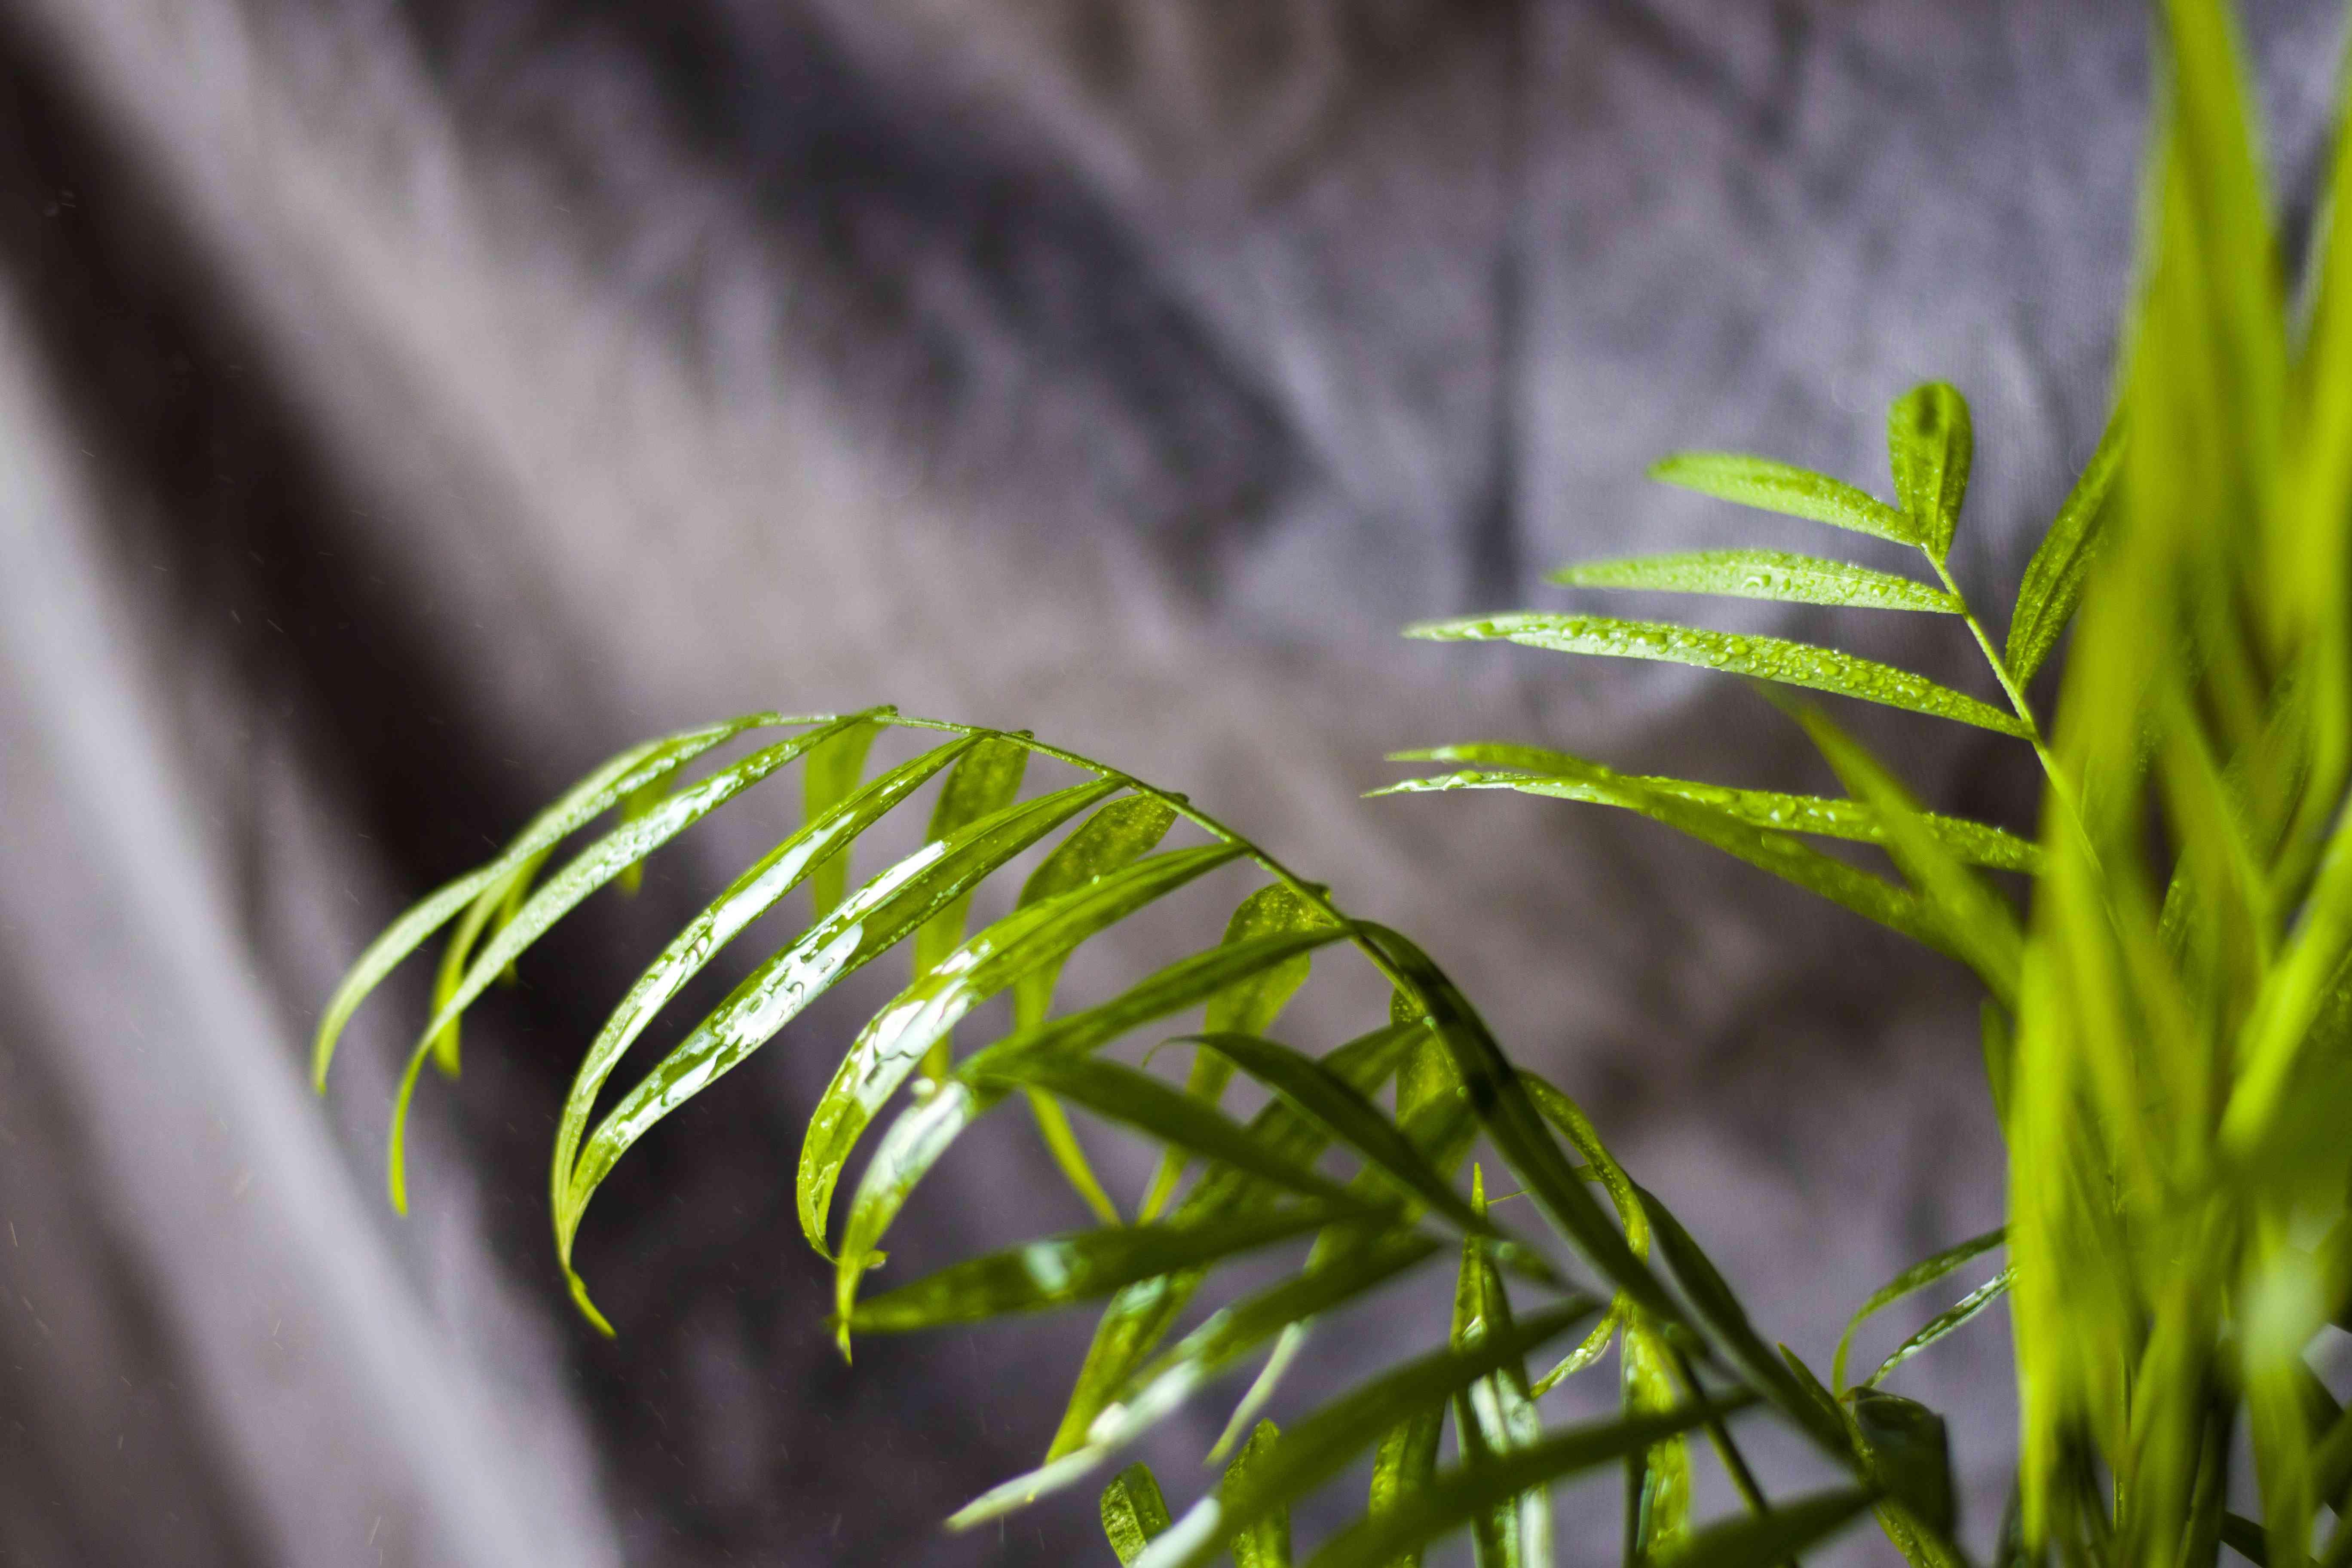 Indoor palm tree, Chrysalidocarpus Lutescens Areca plants, home air plants in room